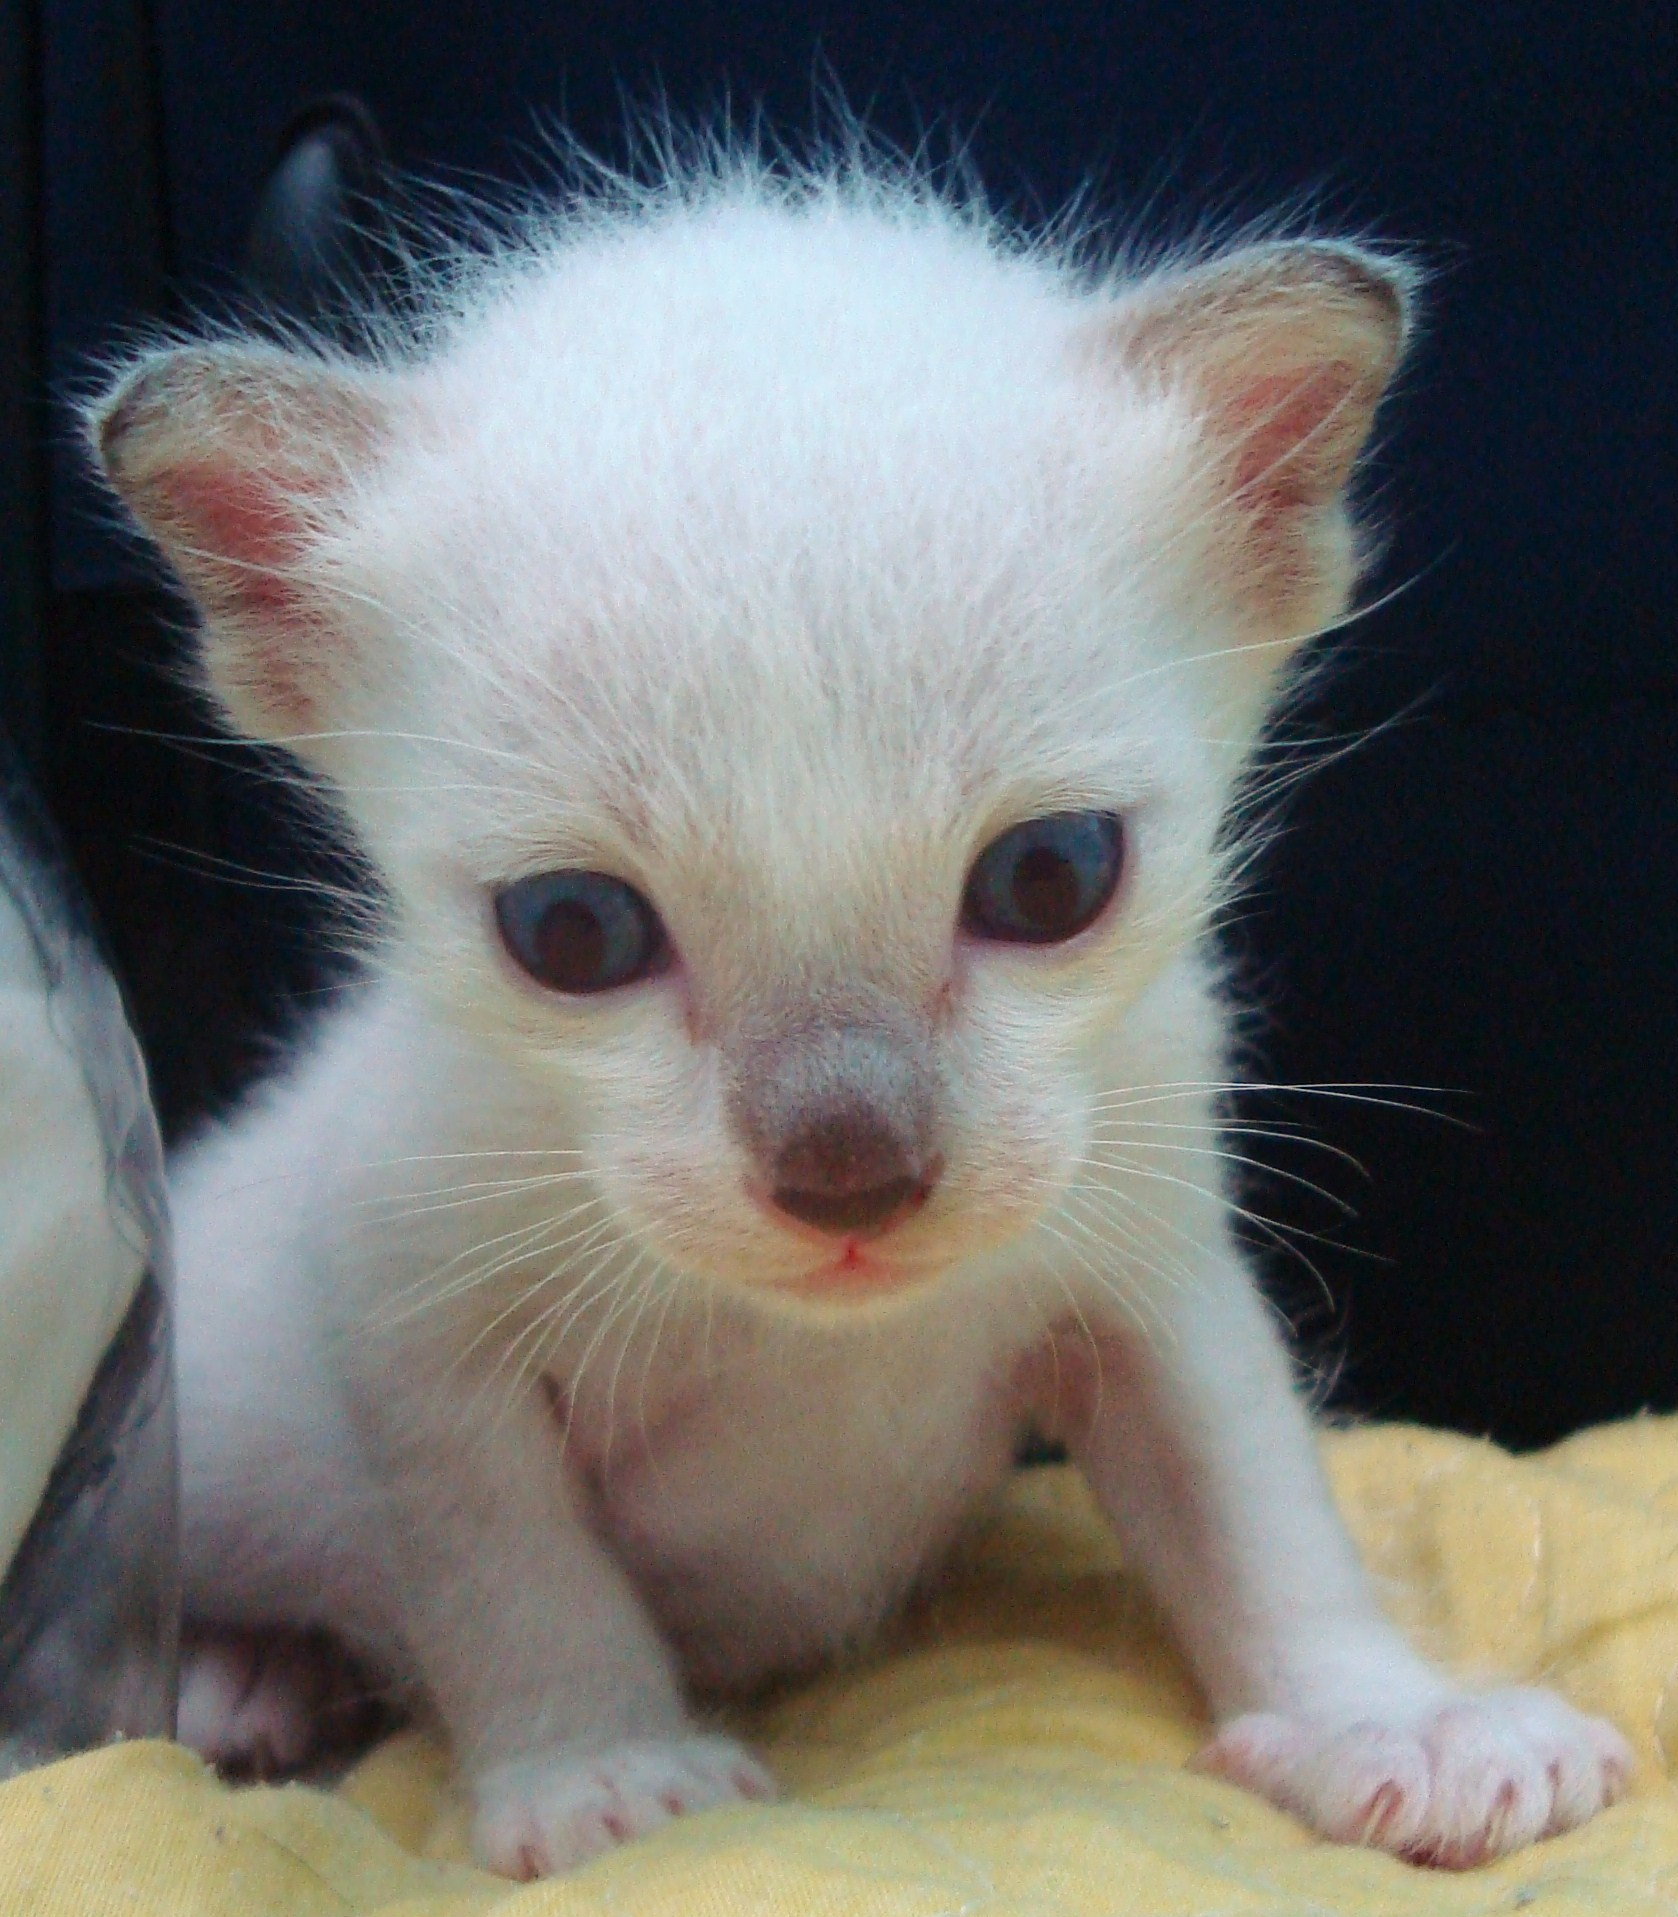 Albino Burmese Kitten, Albino, Fuzzy, Unusual, Thailand, HQ Photo